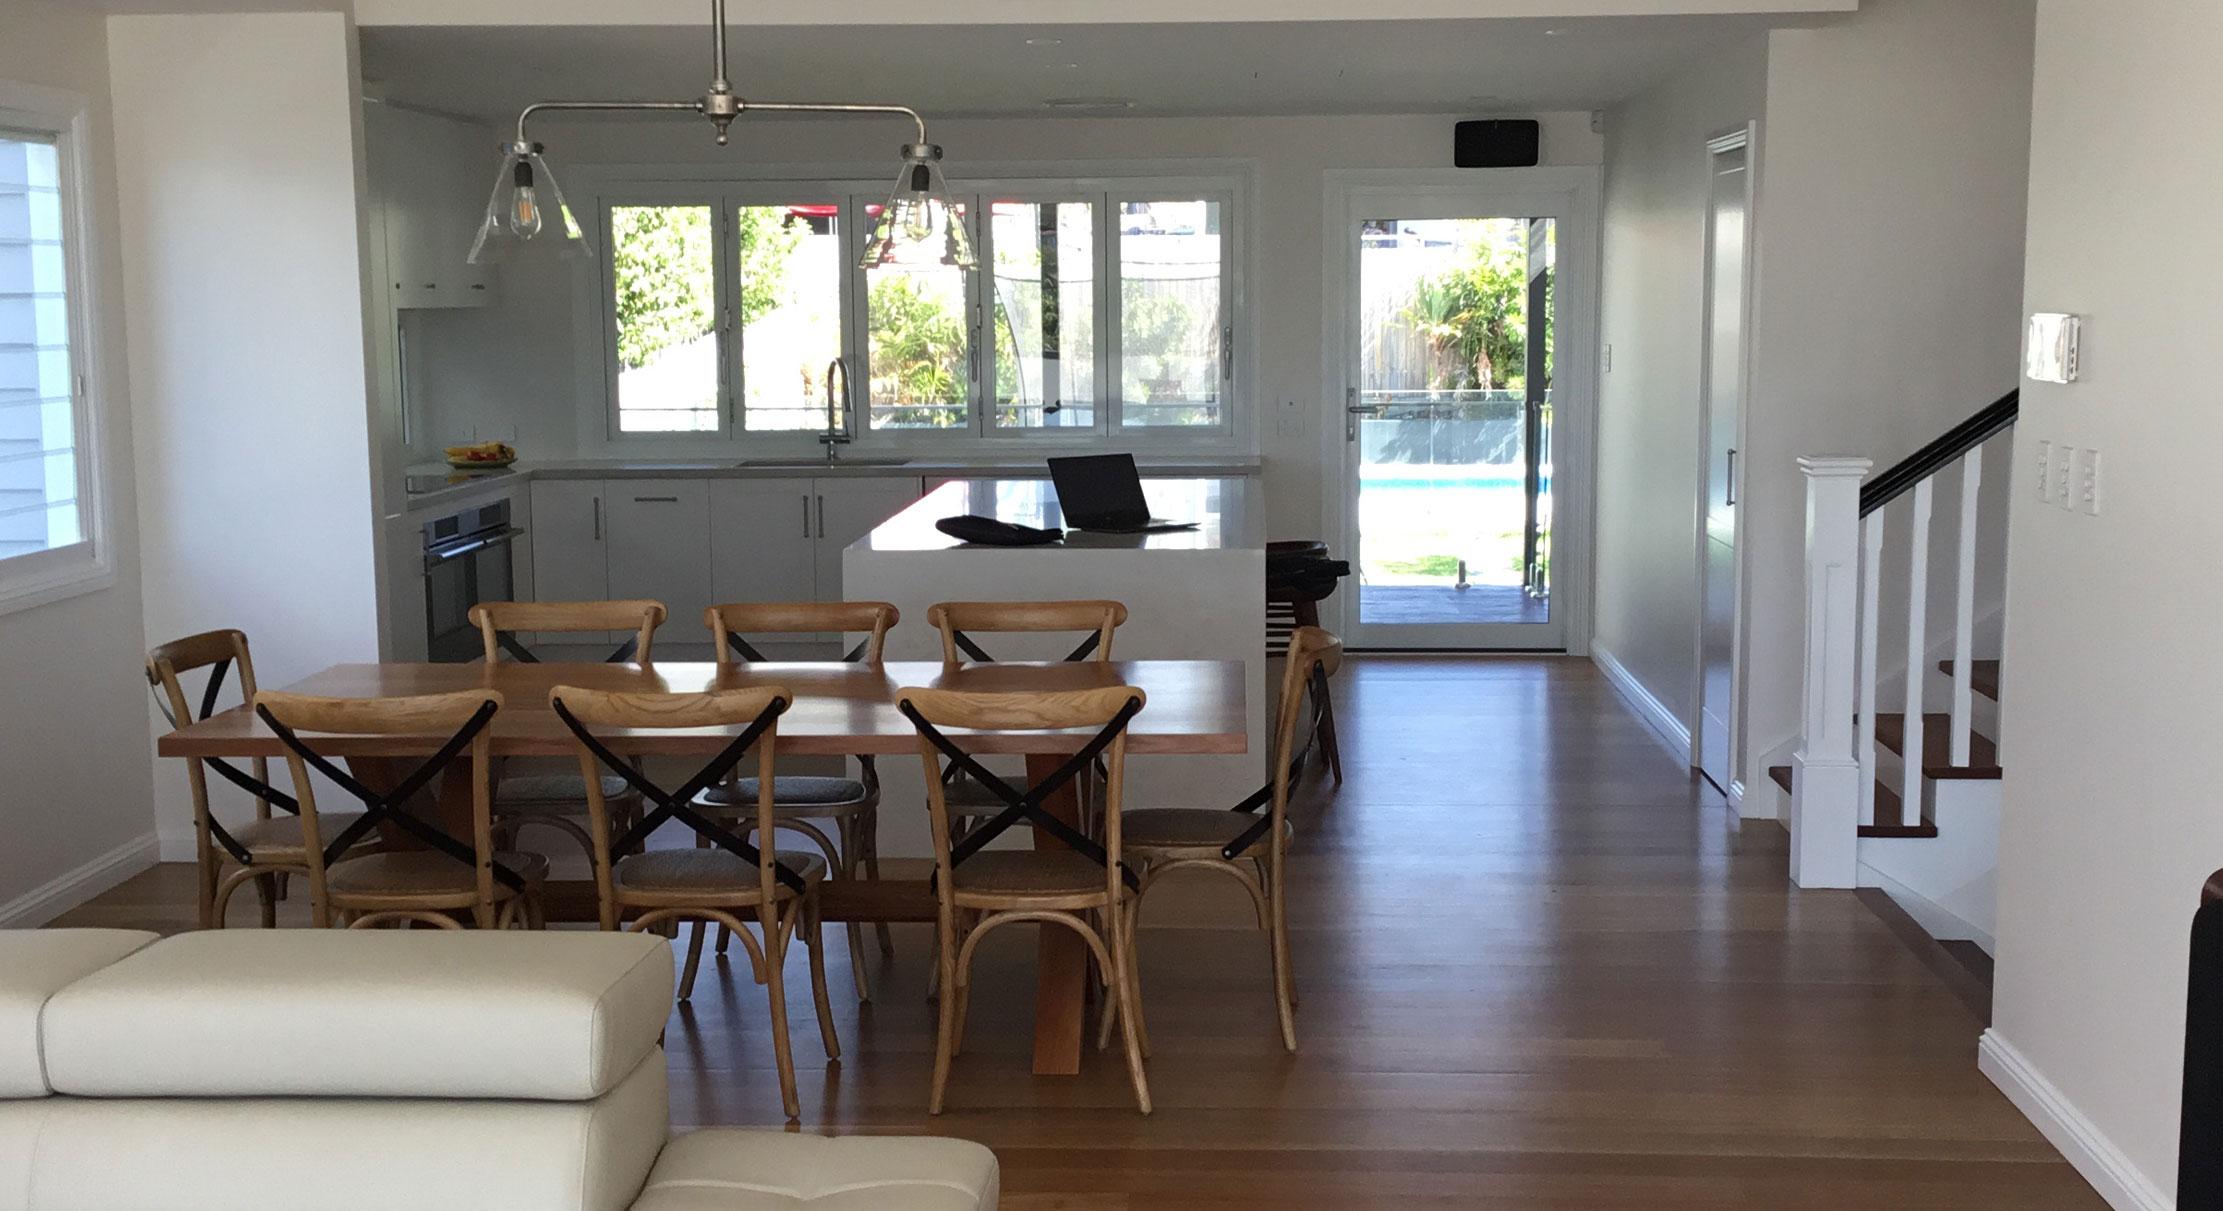 portfolio-5-slider-image-2-dining-room-norman-park-gary-cramb-constructions-brisbane